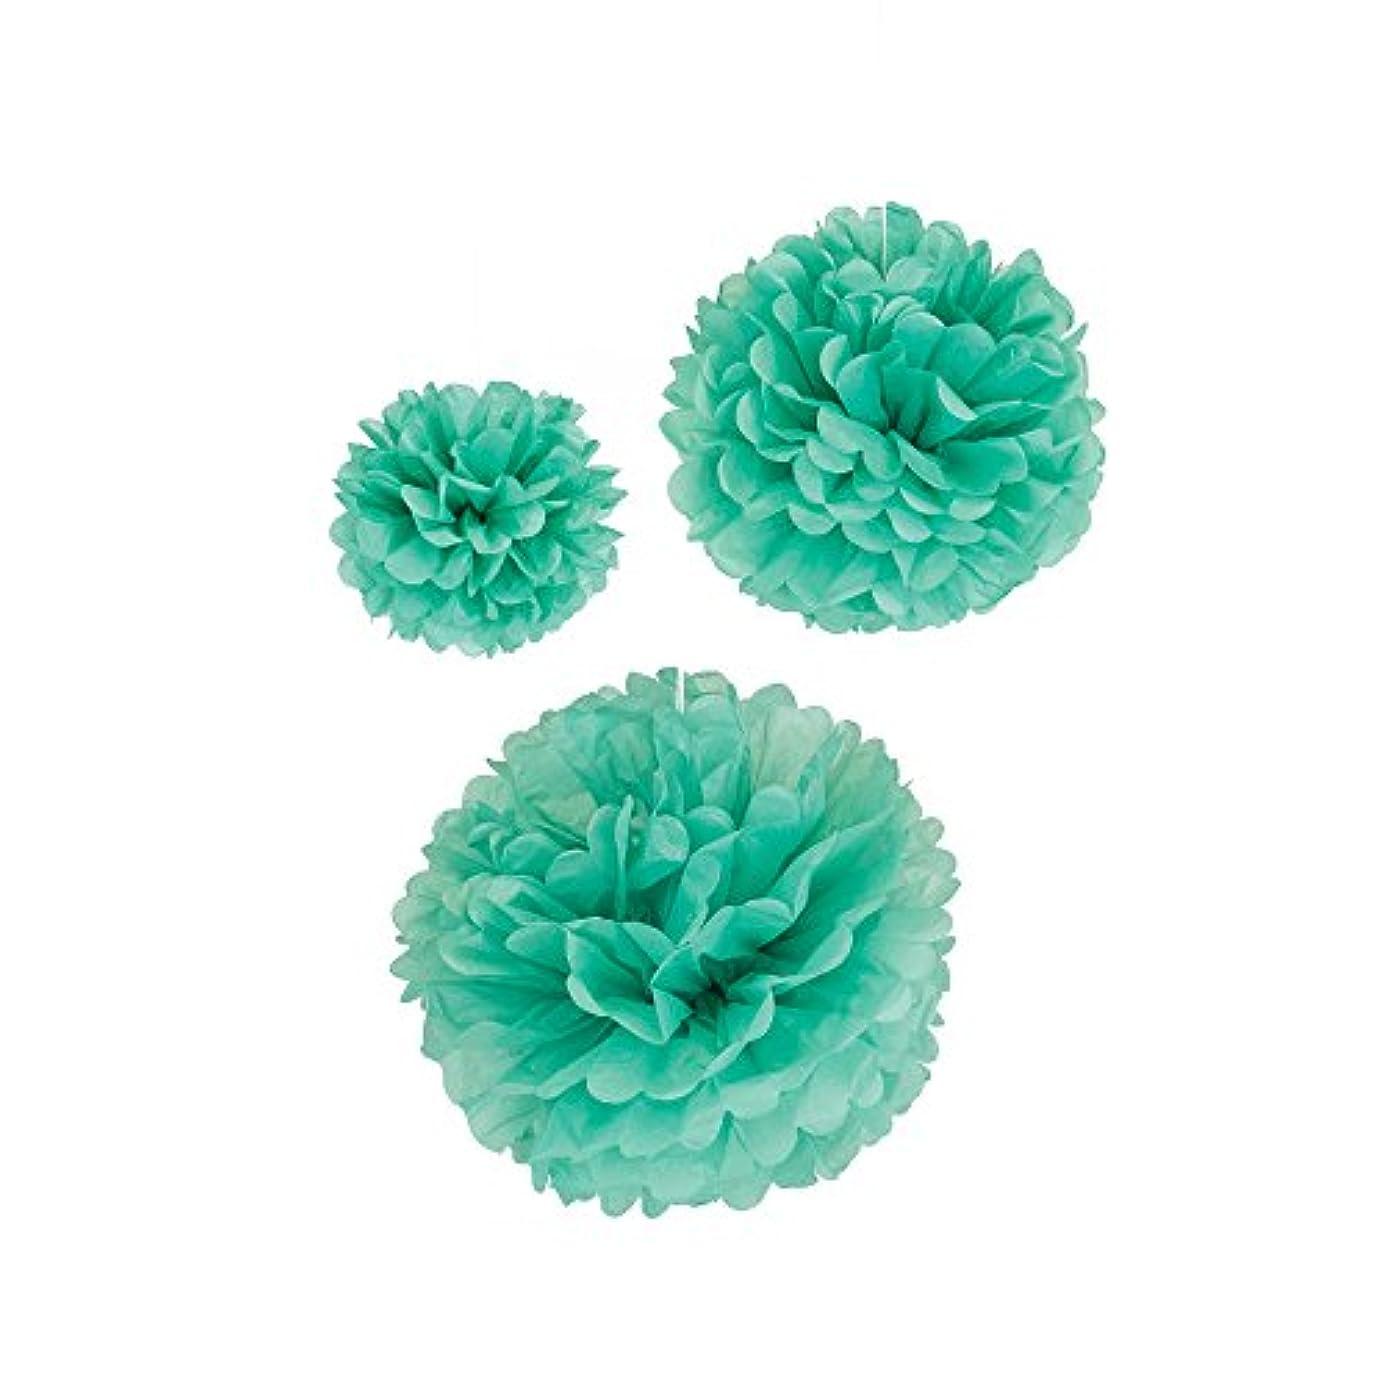 LUV RIBBONS PPT001-315 3 Piece Tissue Pom Flower Ball, 8